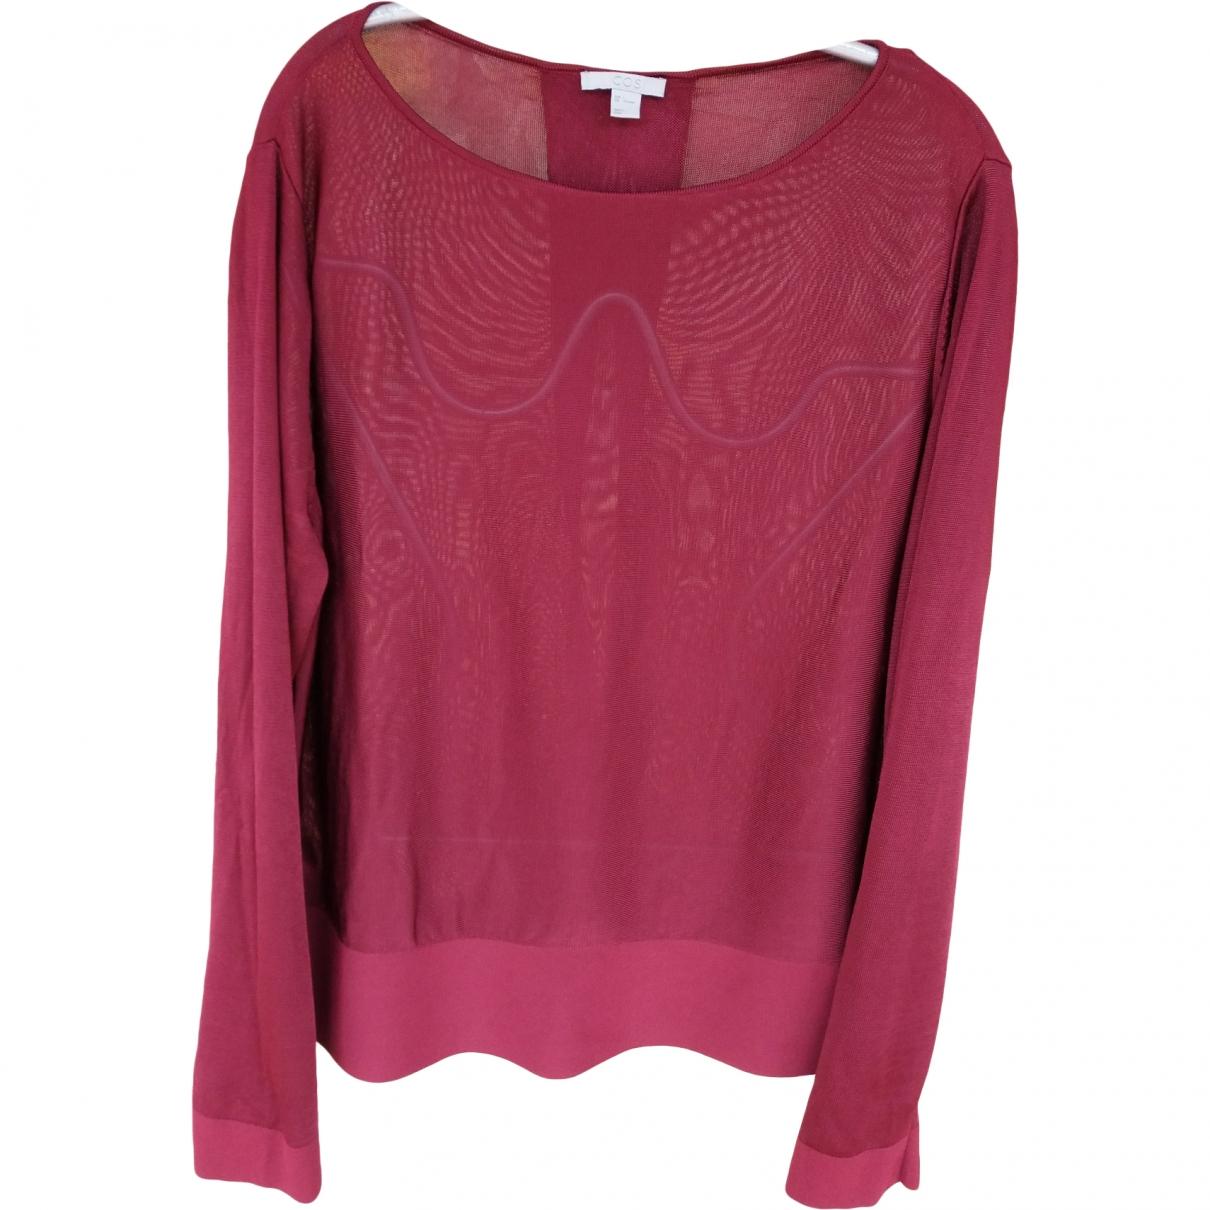 Cos \N Burgundy Knitwear for Women L International